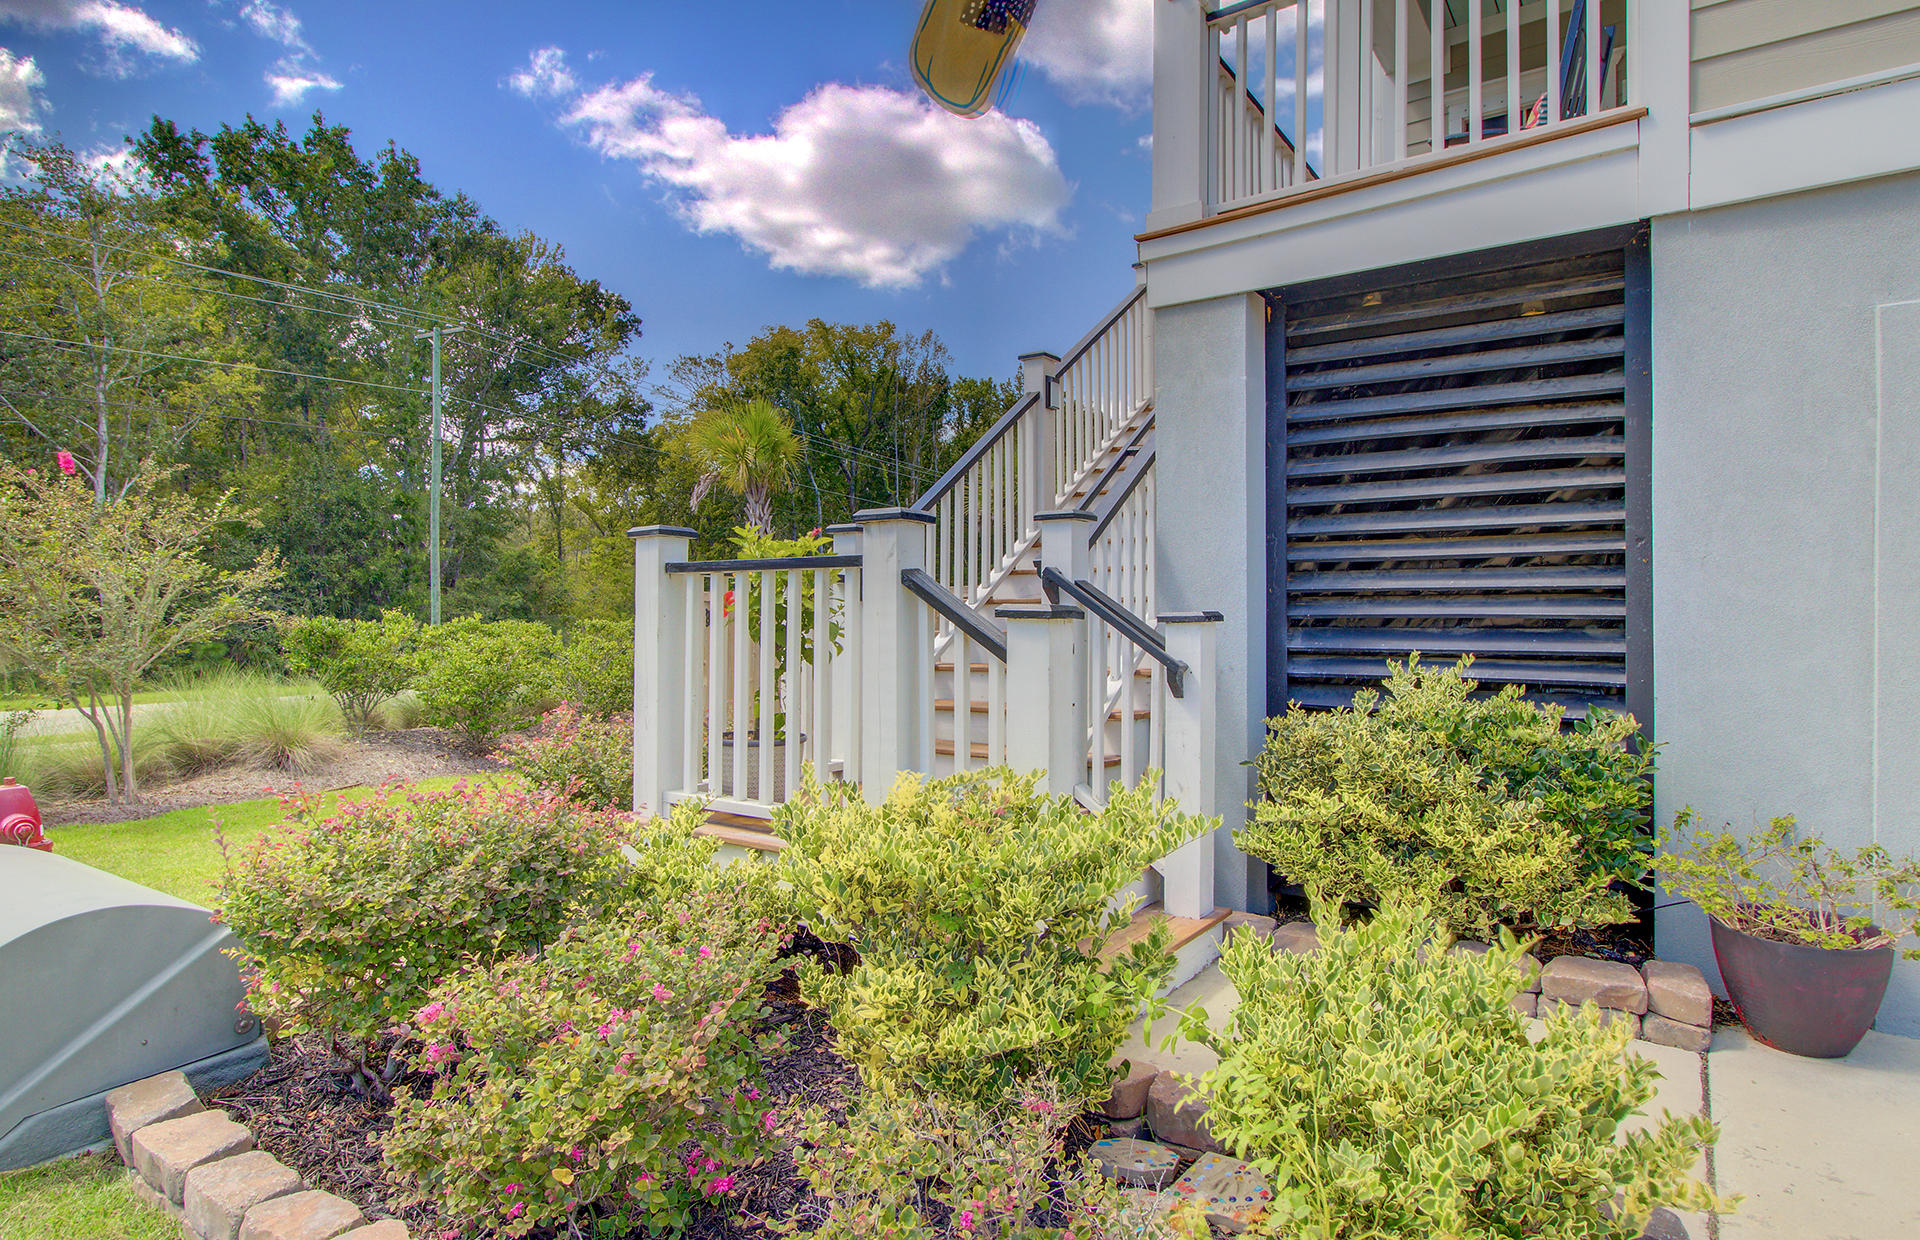 Copahee Landing Homes For Sale - 3726 Copahee Sound, Mount Pleasant, SC - 21